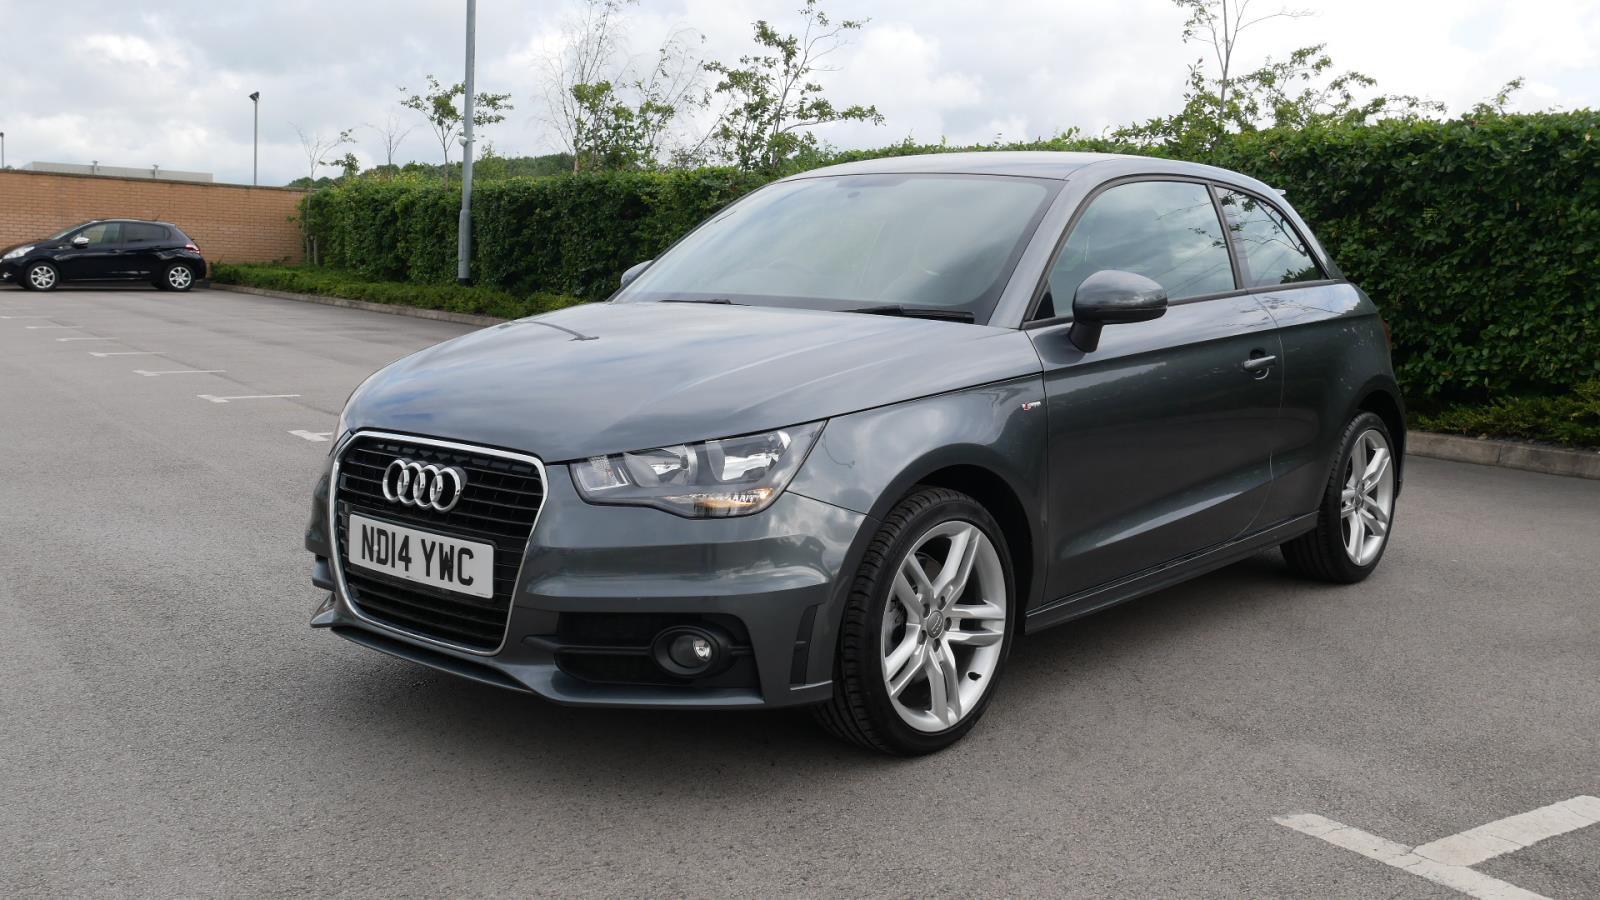 Used Audi A1 1 4 Tfsi S Line 3dr Grey Nd14ywc Sheffield